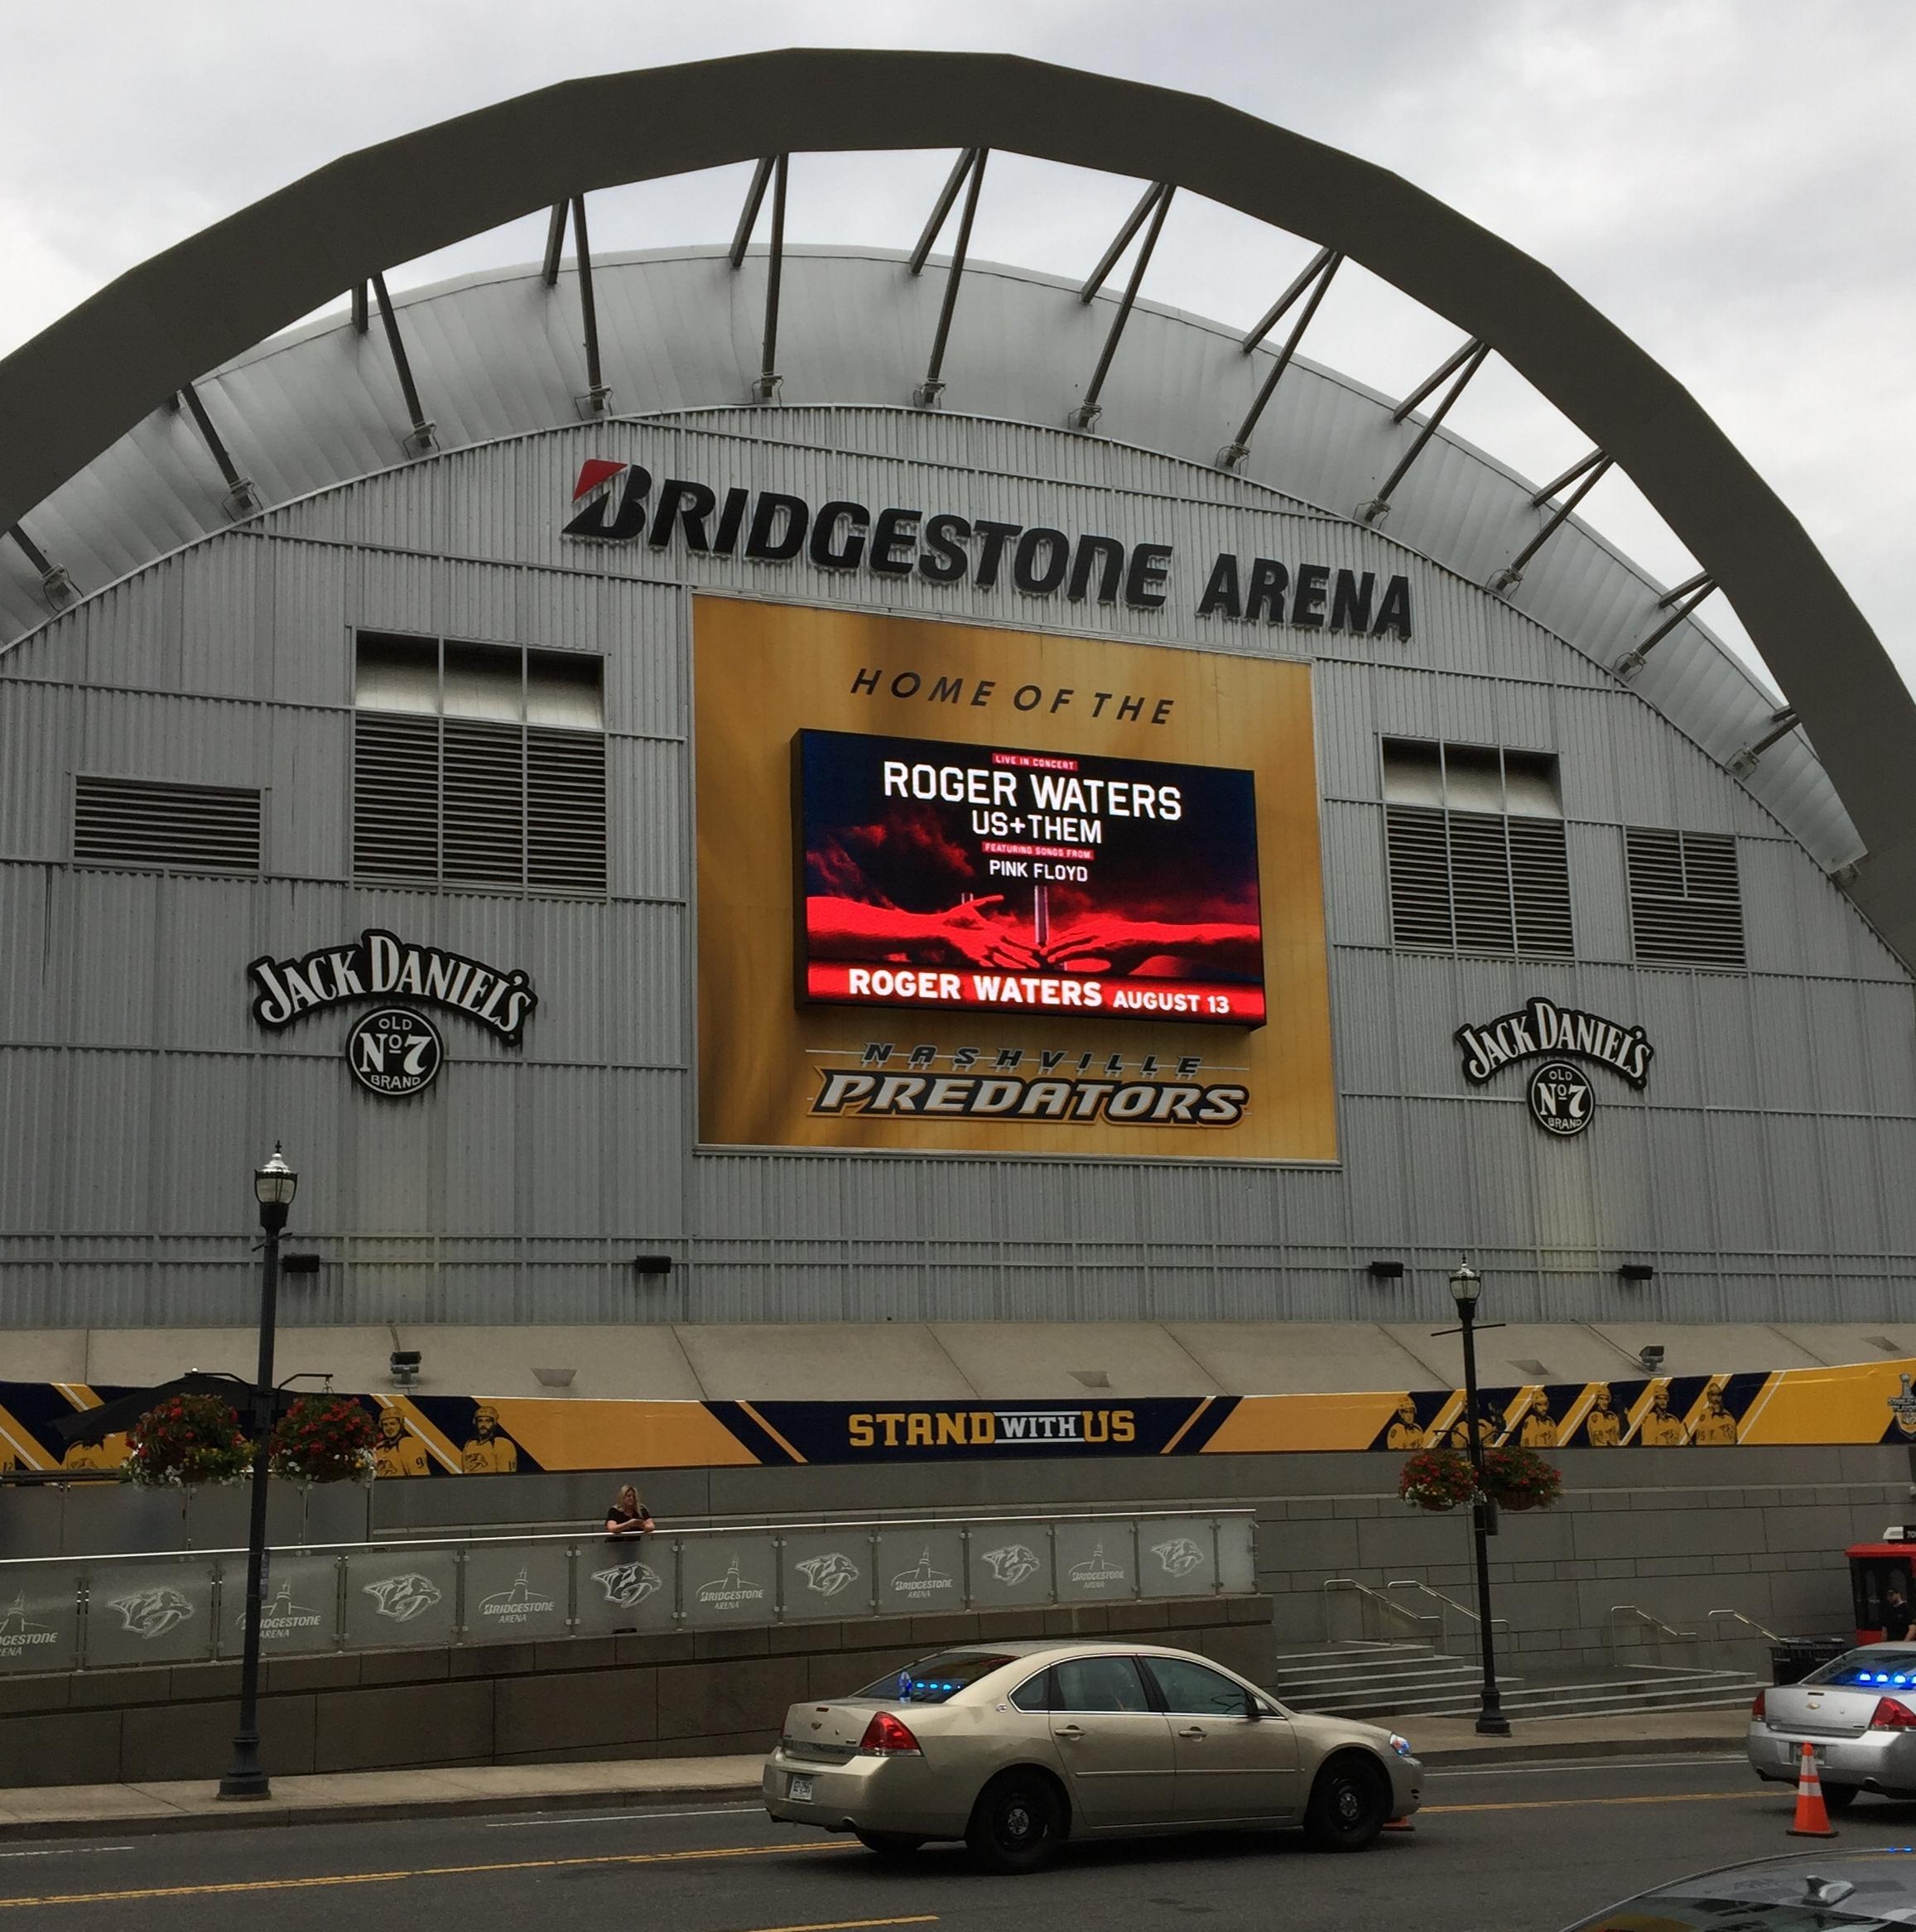 bridgestone arena in nashville, TN